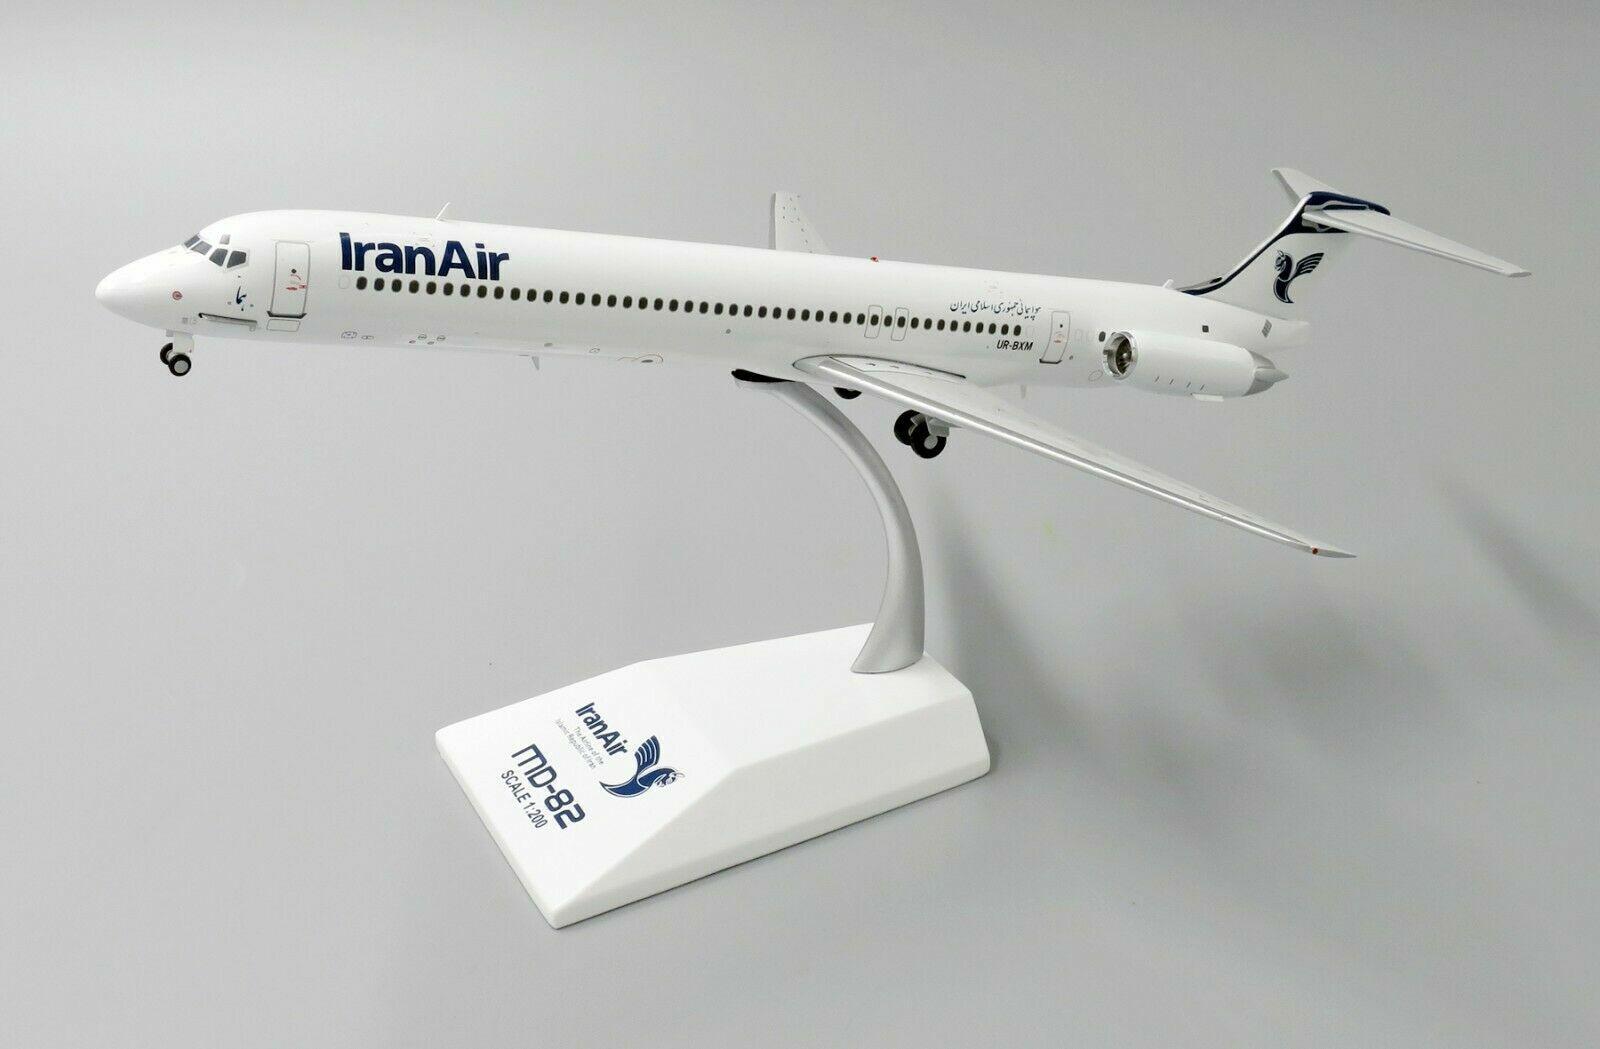 diseñador en linea Jc Wings 1 200 Irán aire McDonnell McDonnell McDonnell Douglas MD-80 Ur-bxm (XX2059)  bajo precio